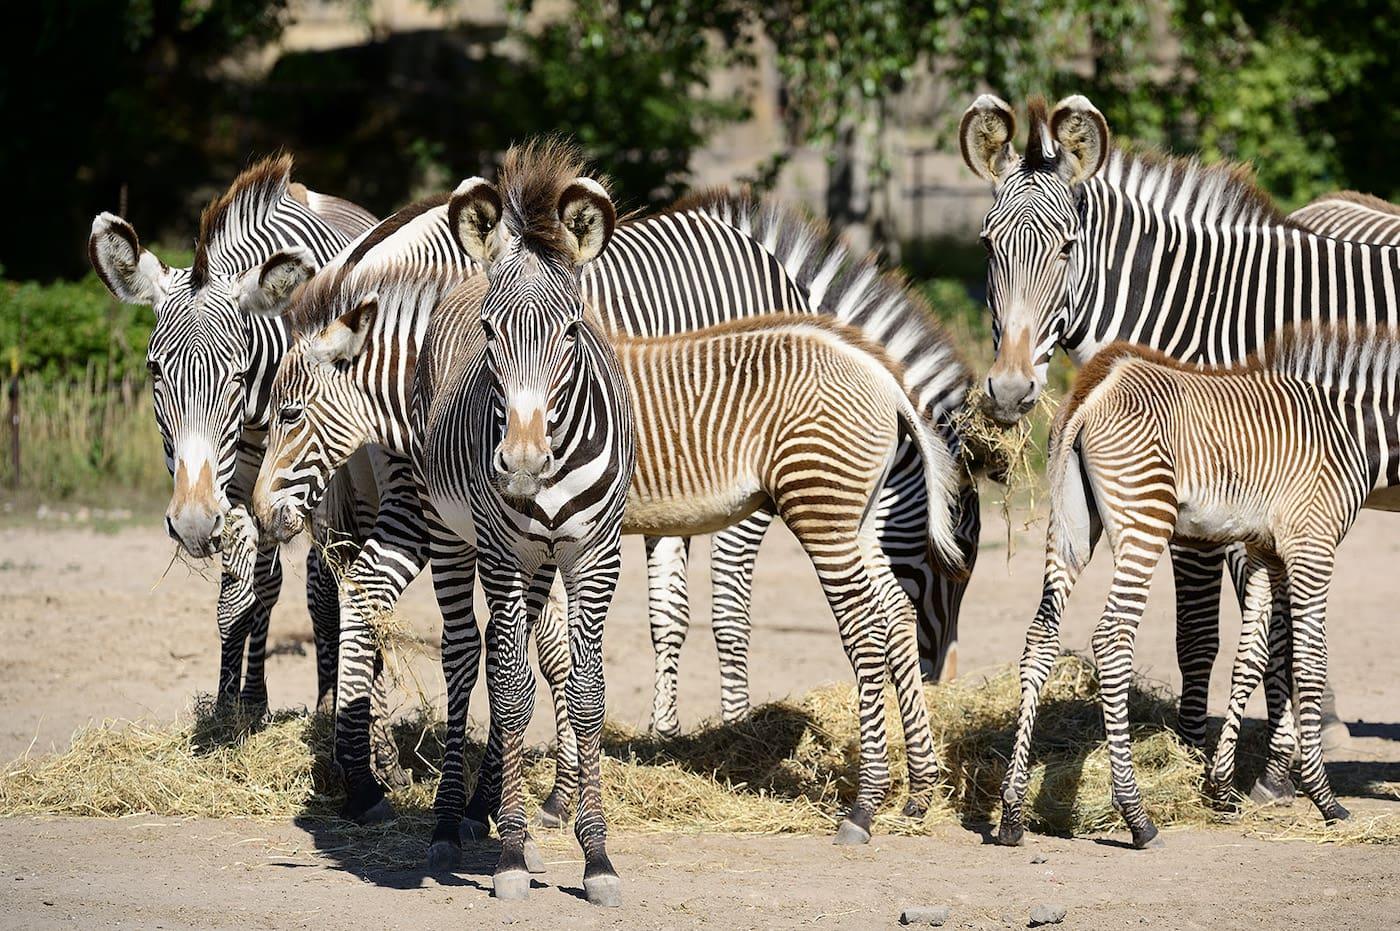 Safari im Tierpark Berlin für Familien mit Kindern in Berlin // HIMBEER